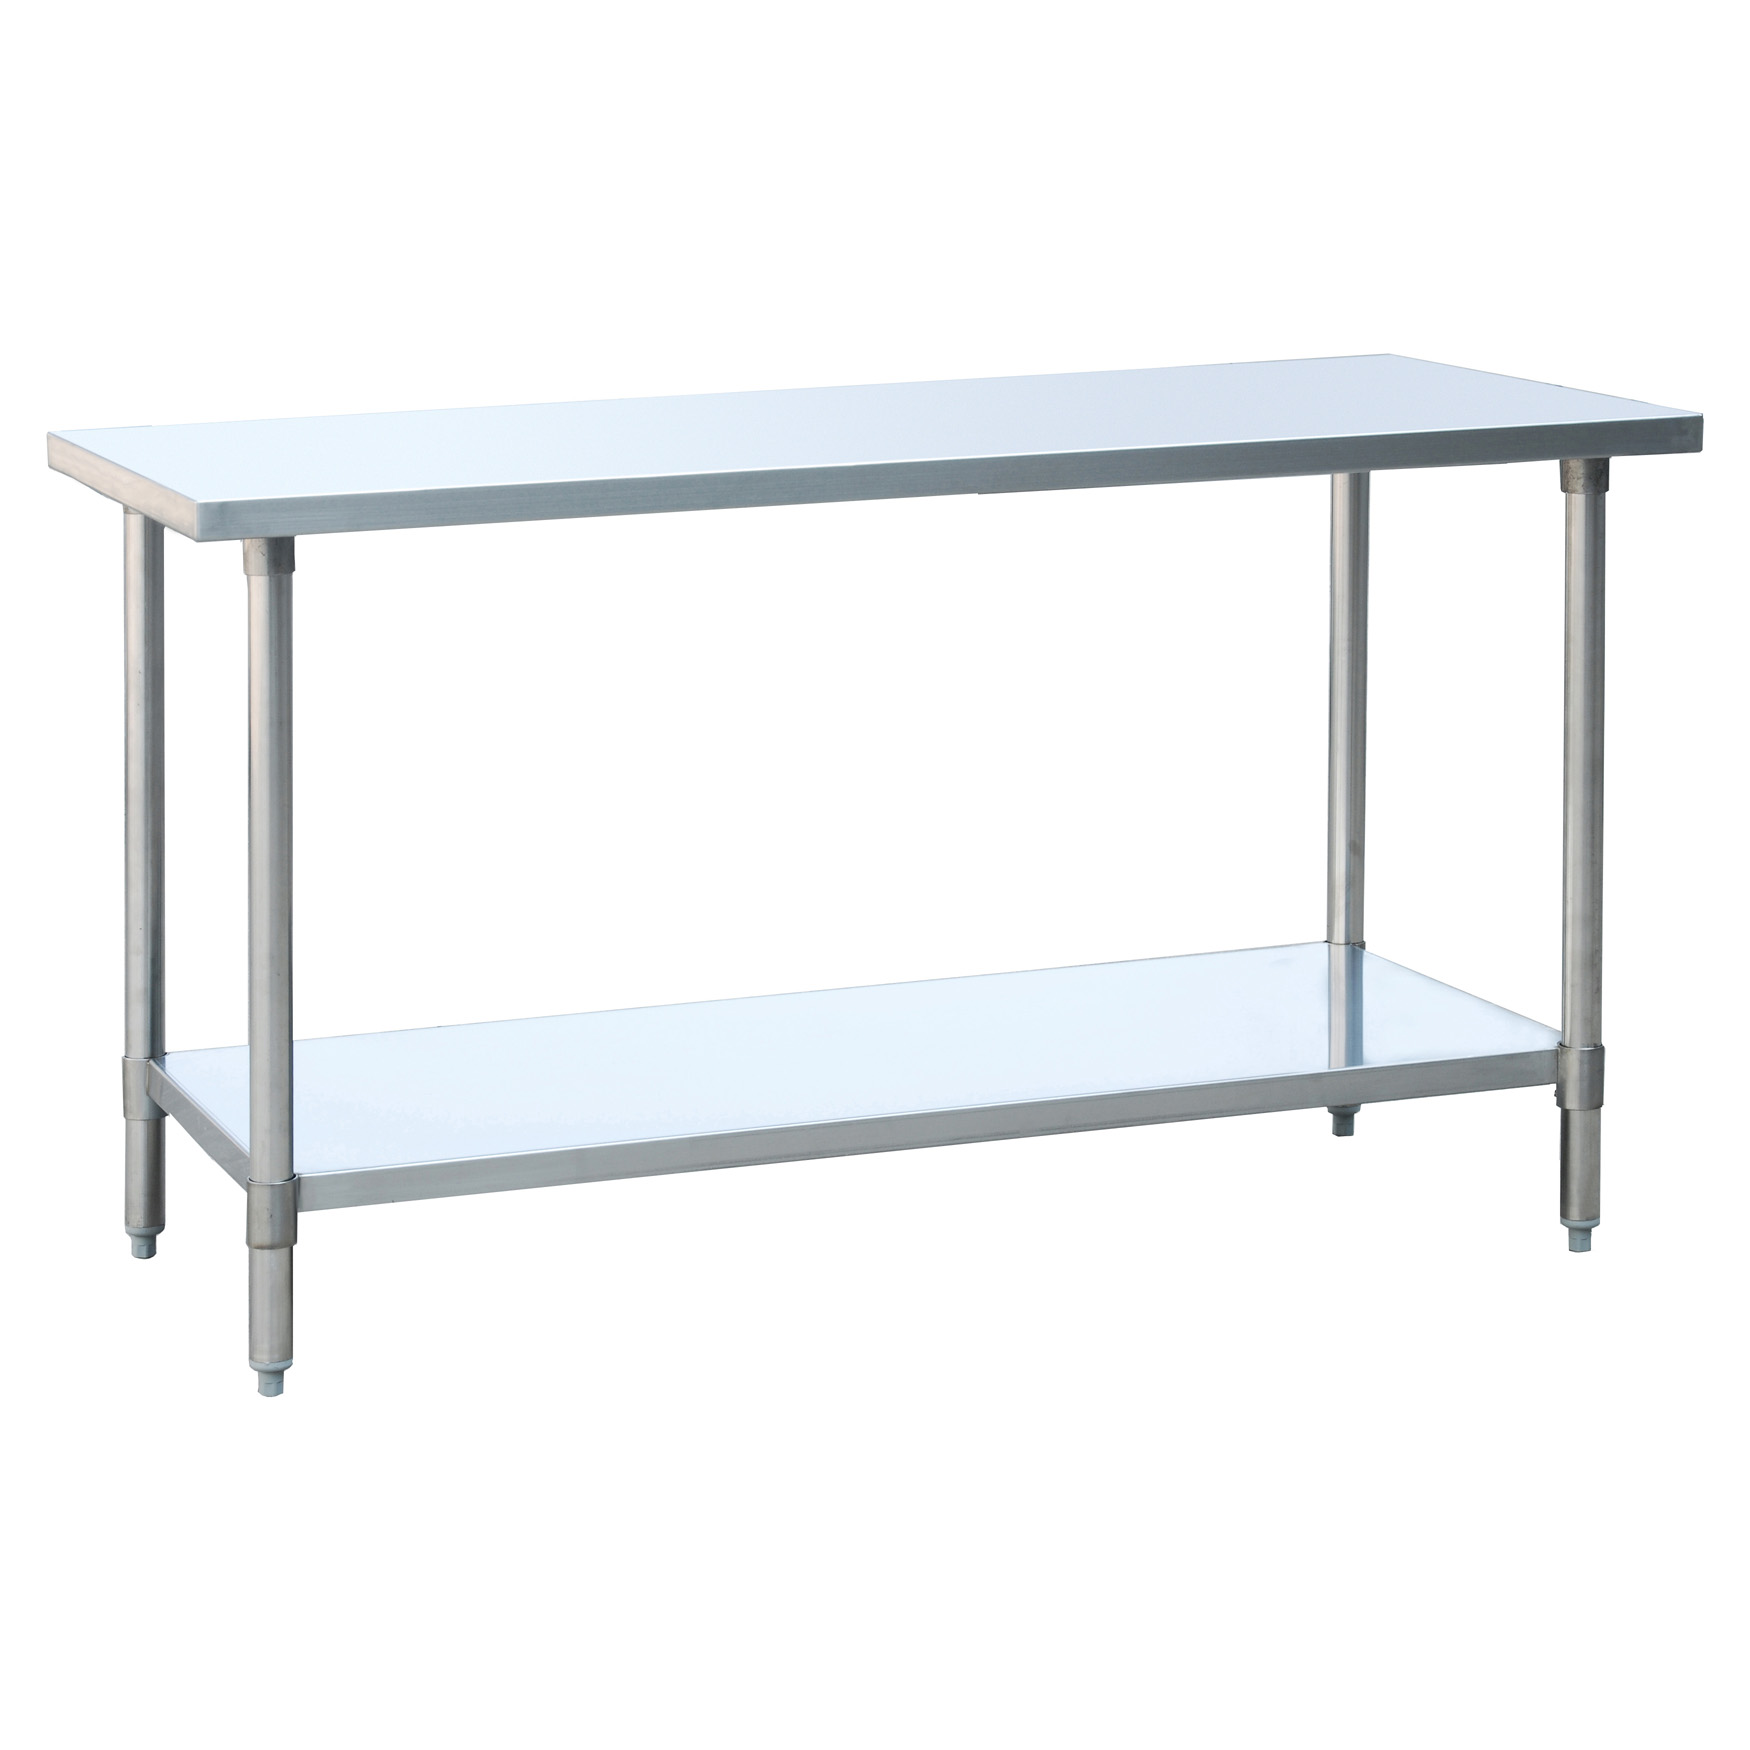 Atosa USA MRTW-3060 work table,  54